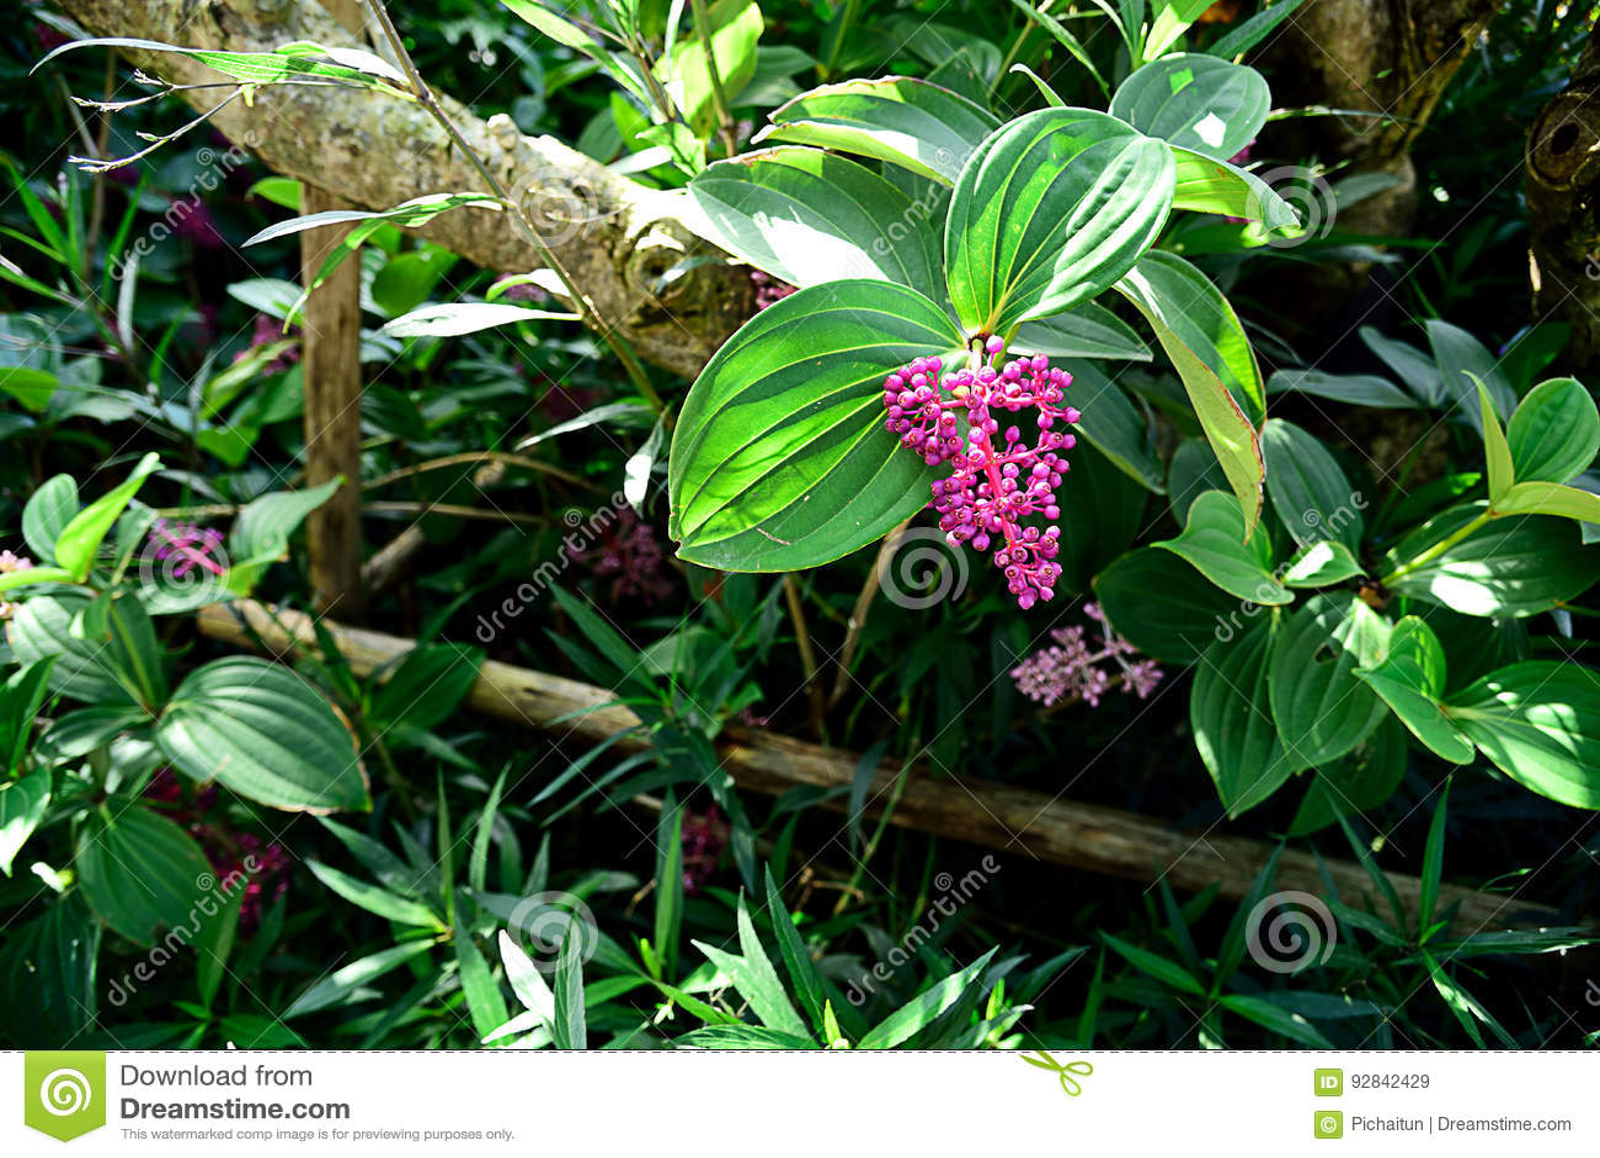 Mandinella stock image image of evergreen ornamental 92842429 image of evergreen ornamental 92842429 mightylinksfo